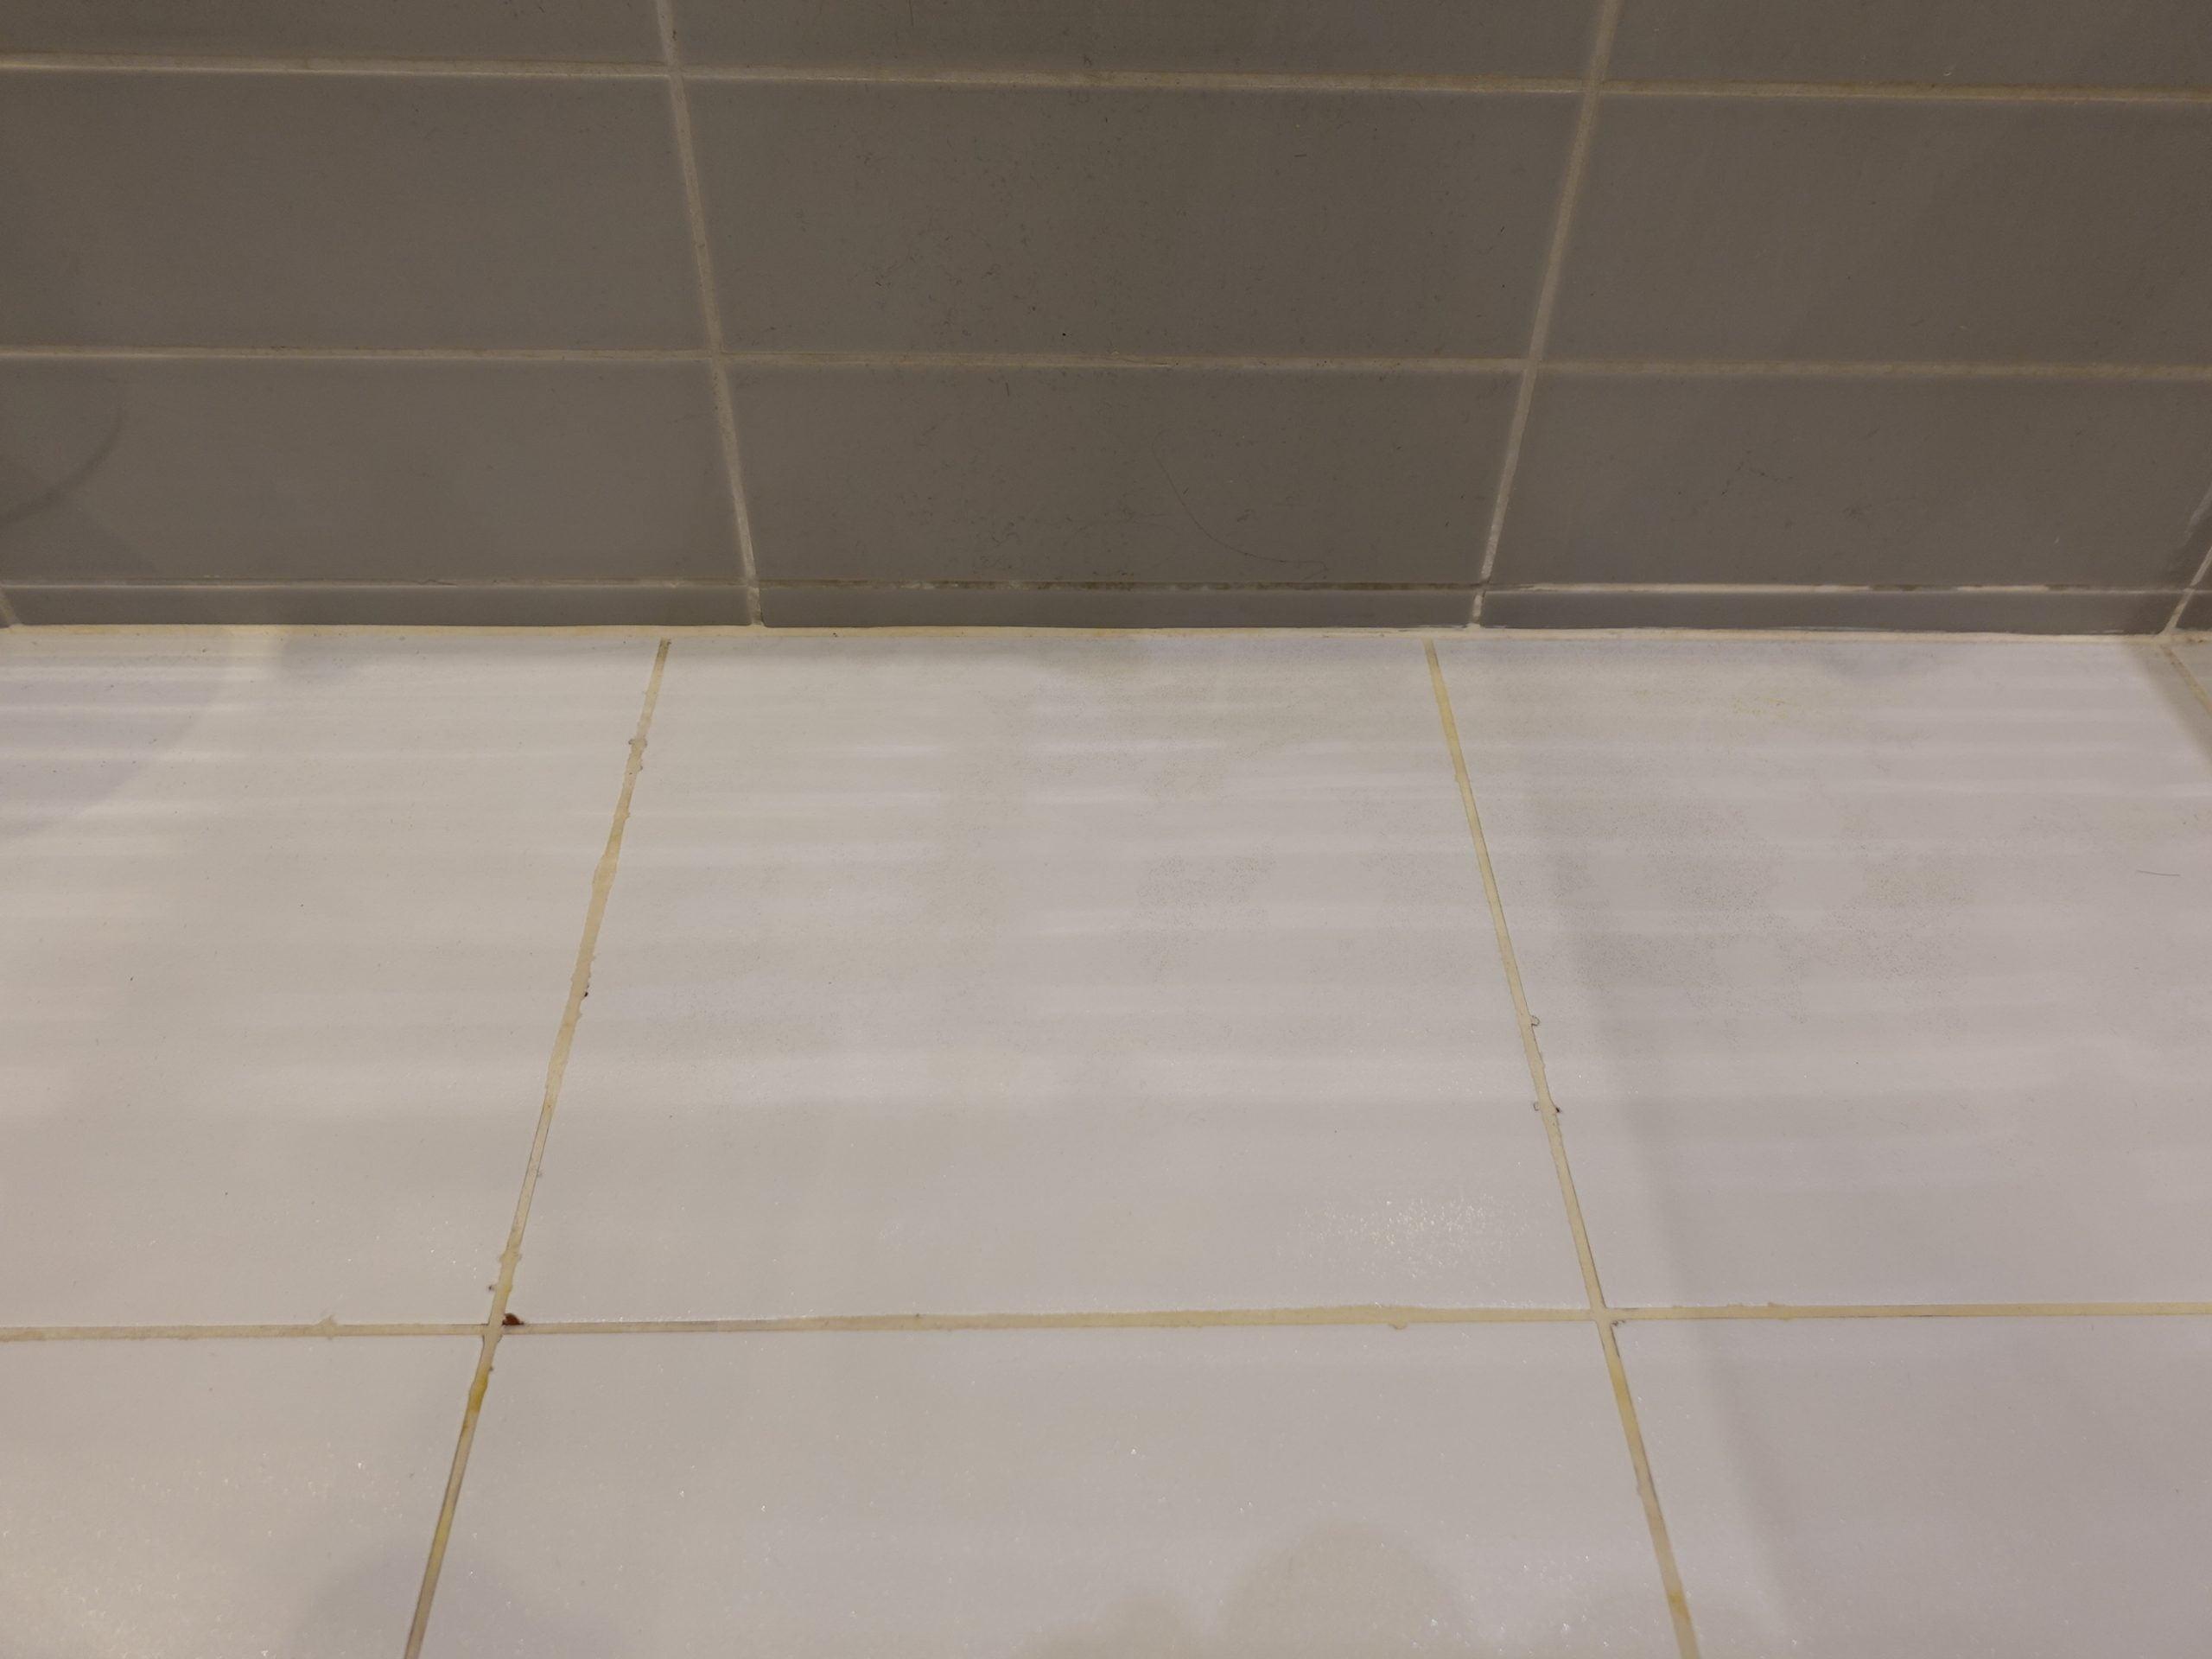 Karcher SC3 Upright EasyFix hard floor tiles clean